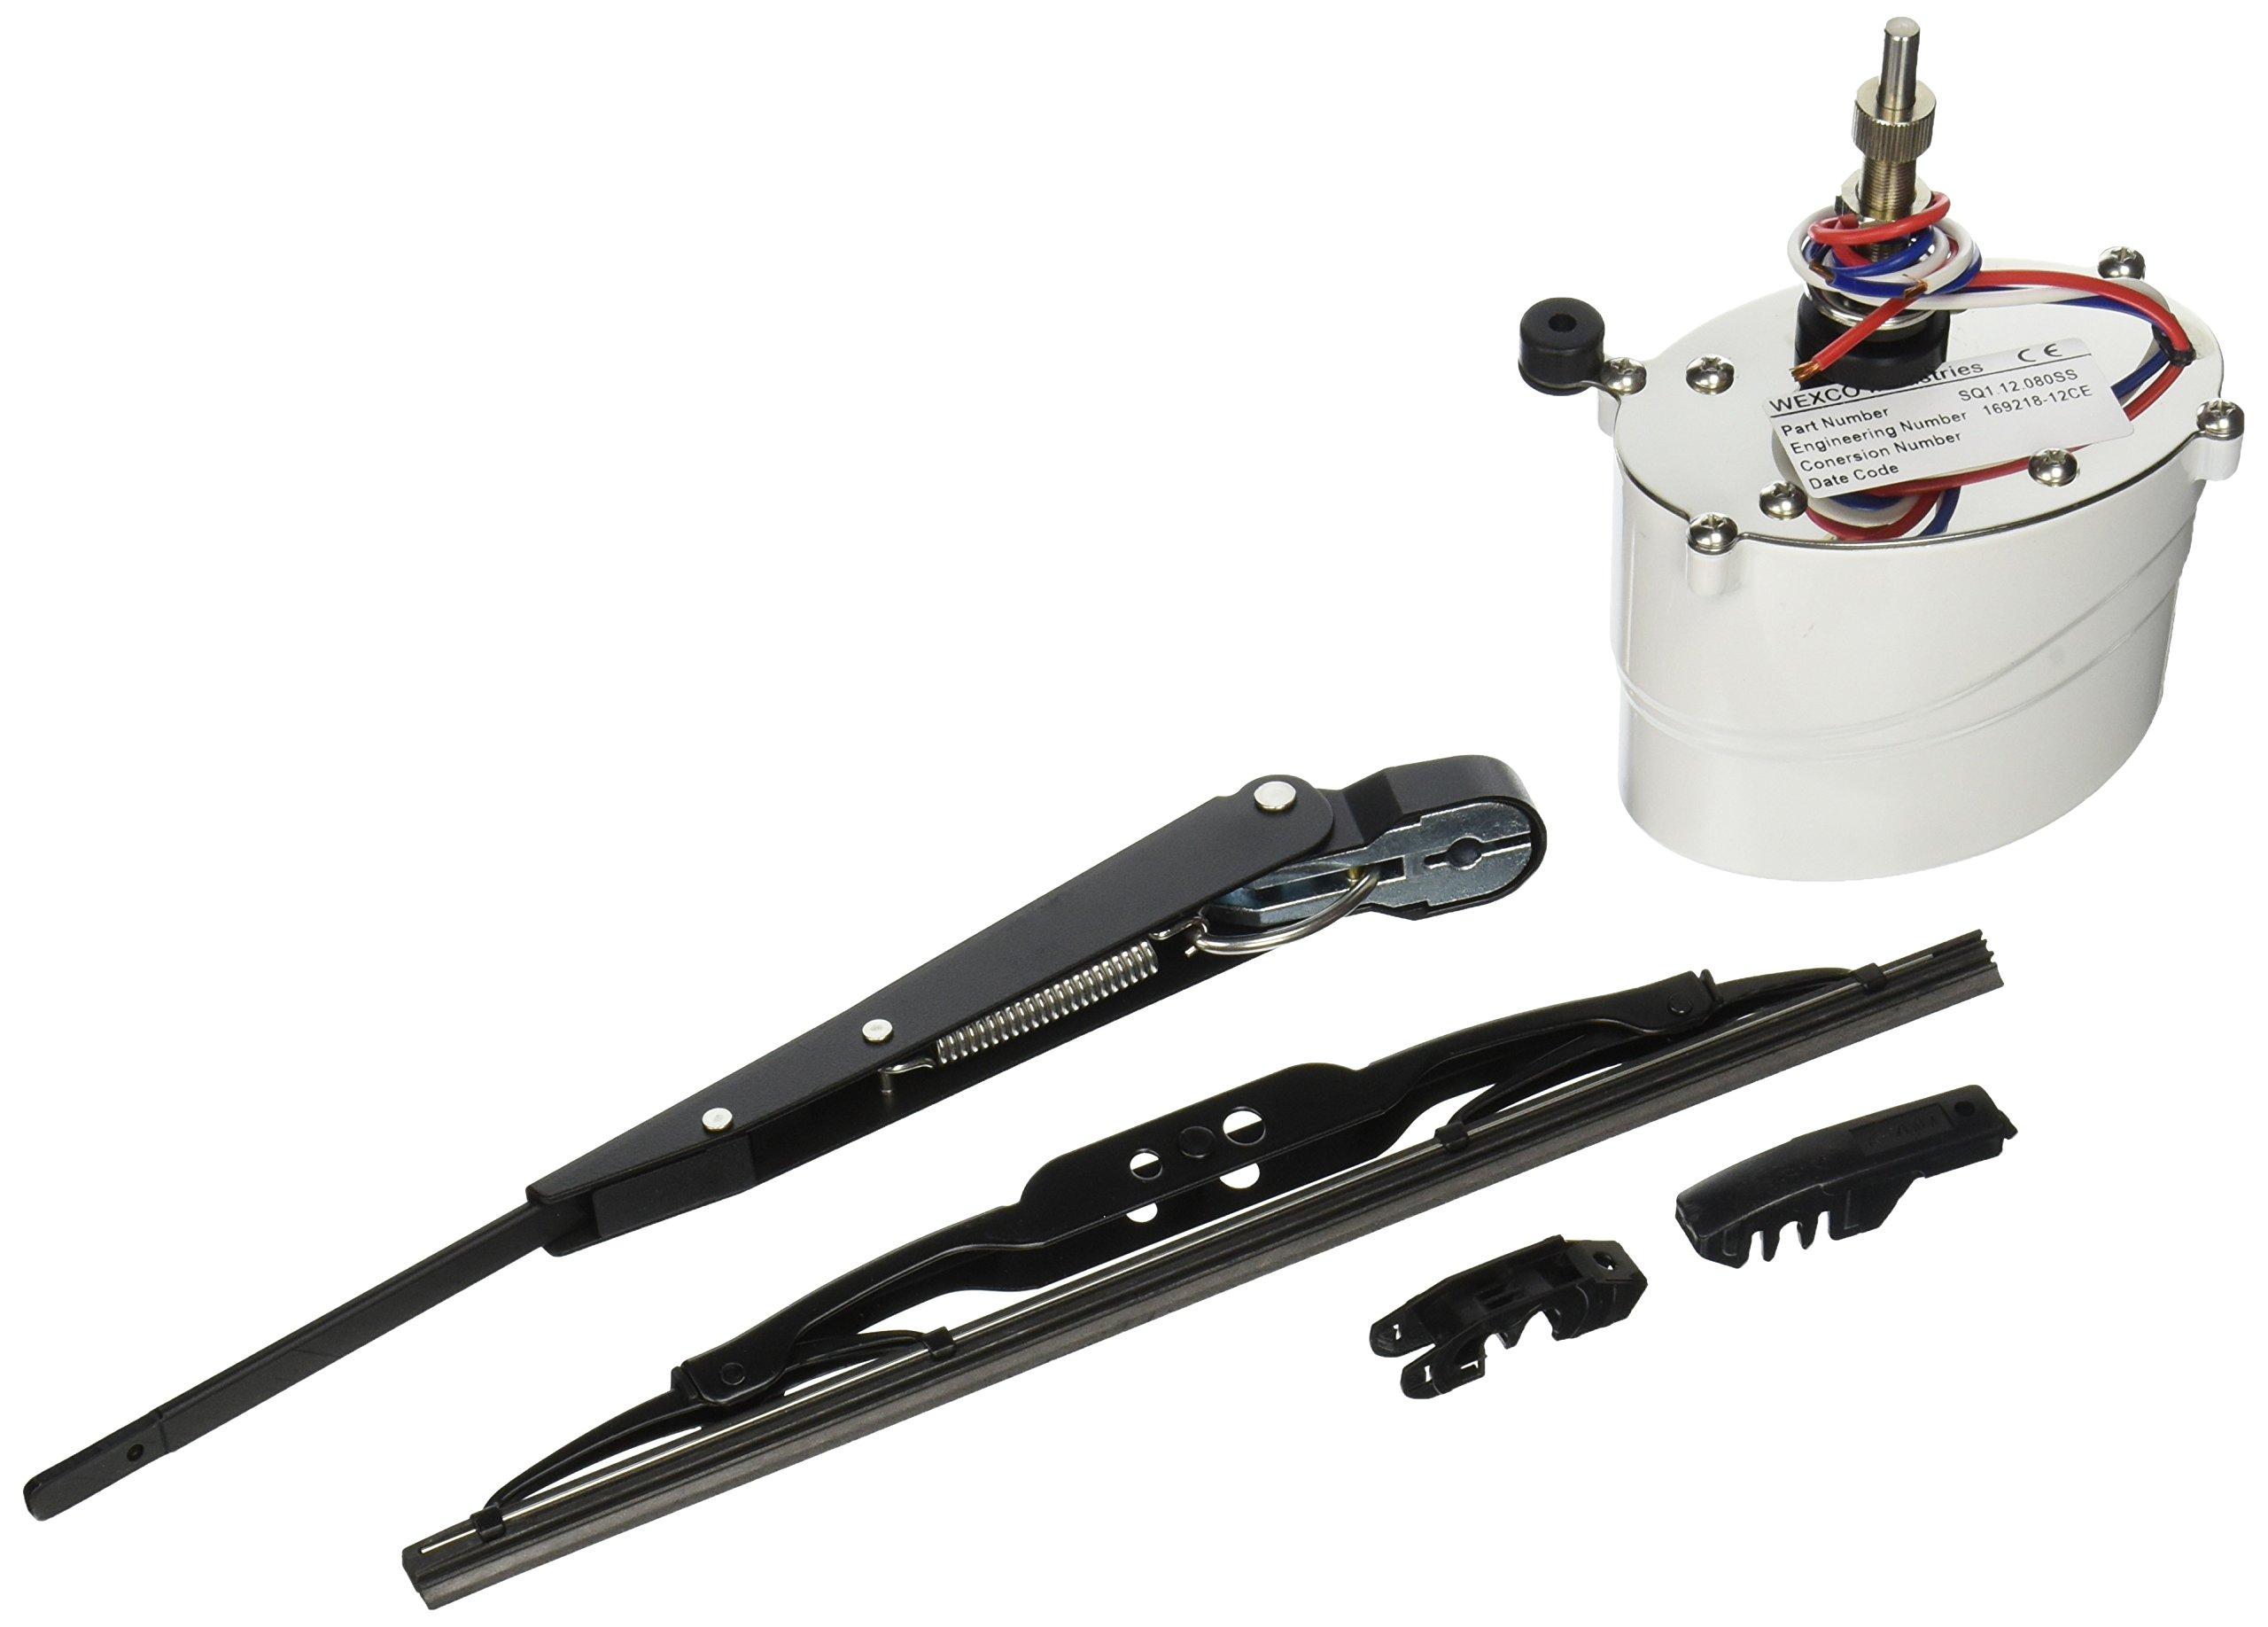 Wexco SQ112110SSK 1.5'' Shaft Marine Windshield Wiper Kit, 12V, 80-Degree Sweep